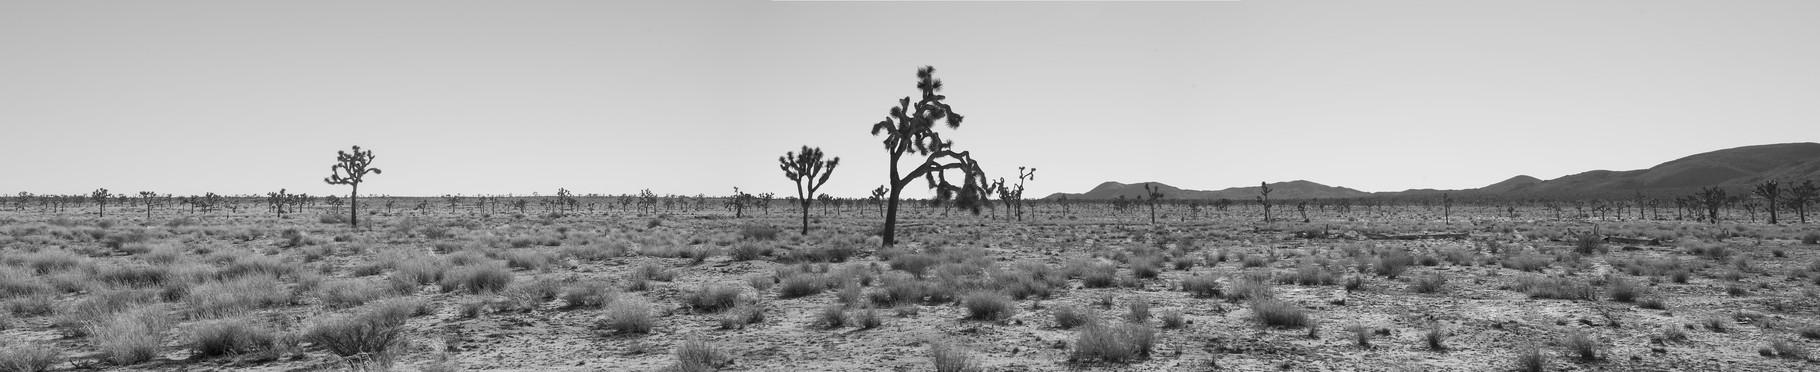 Foto: Ilaria Merli...Joshua Tree National Park